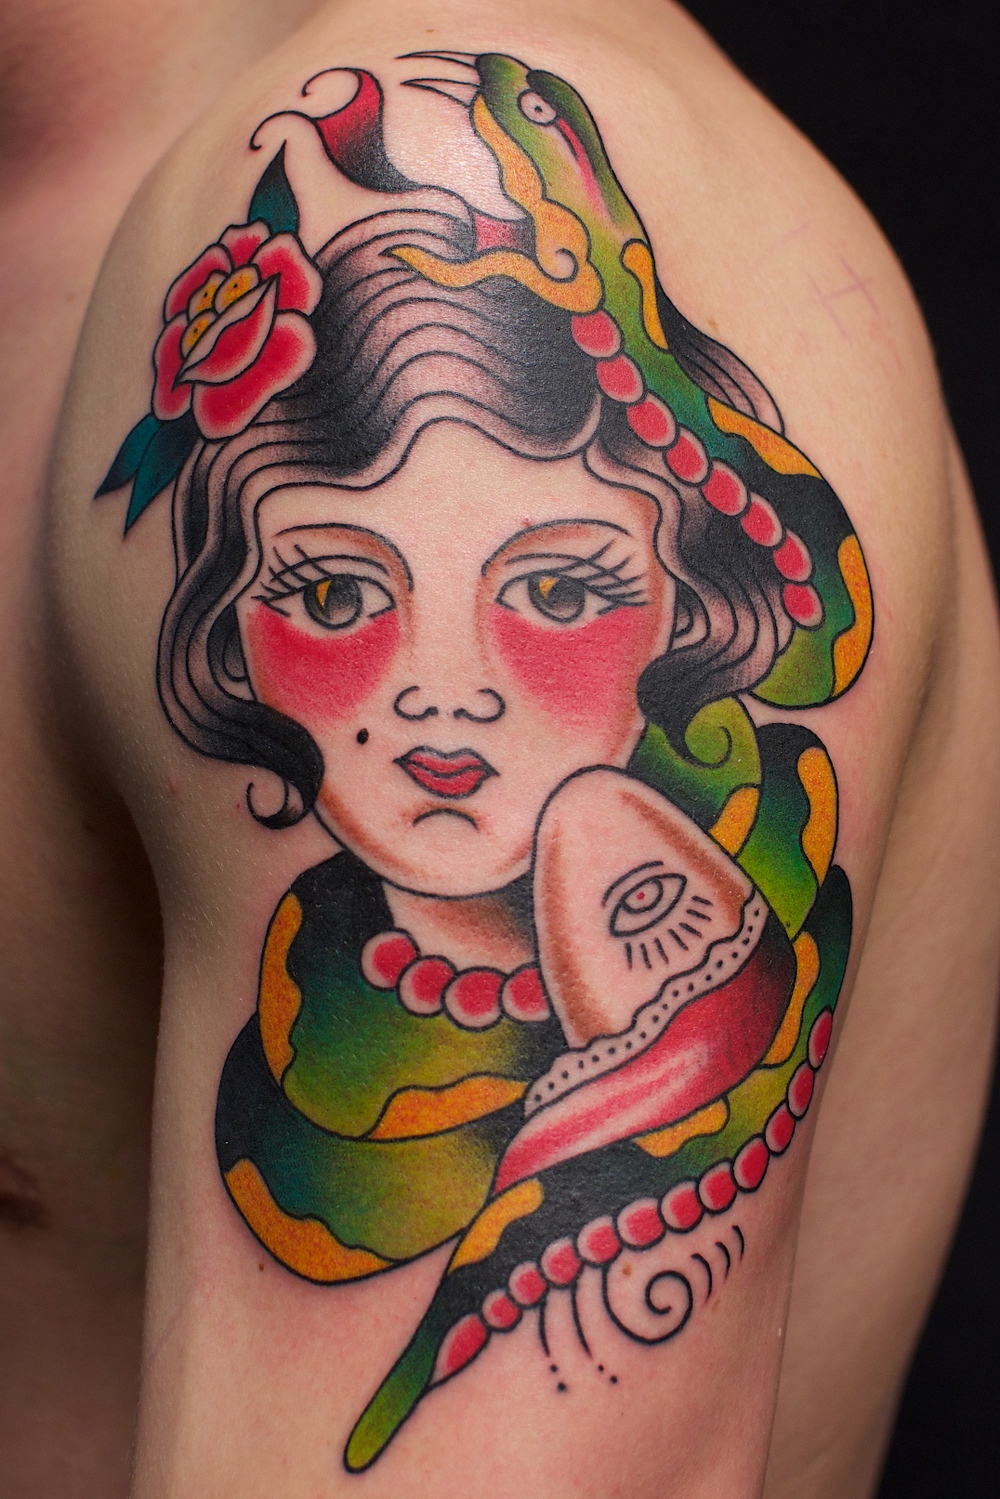 01042013 Tattoos 16 17.jpg